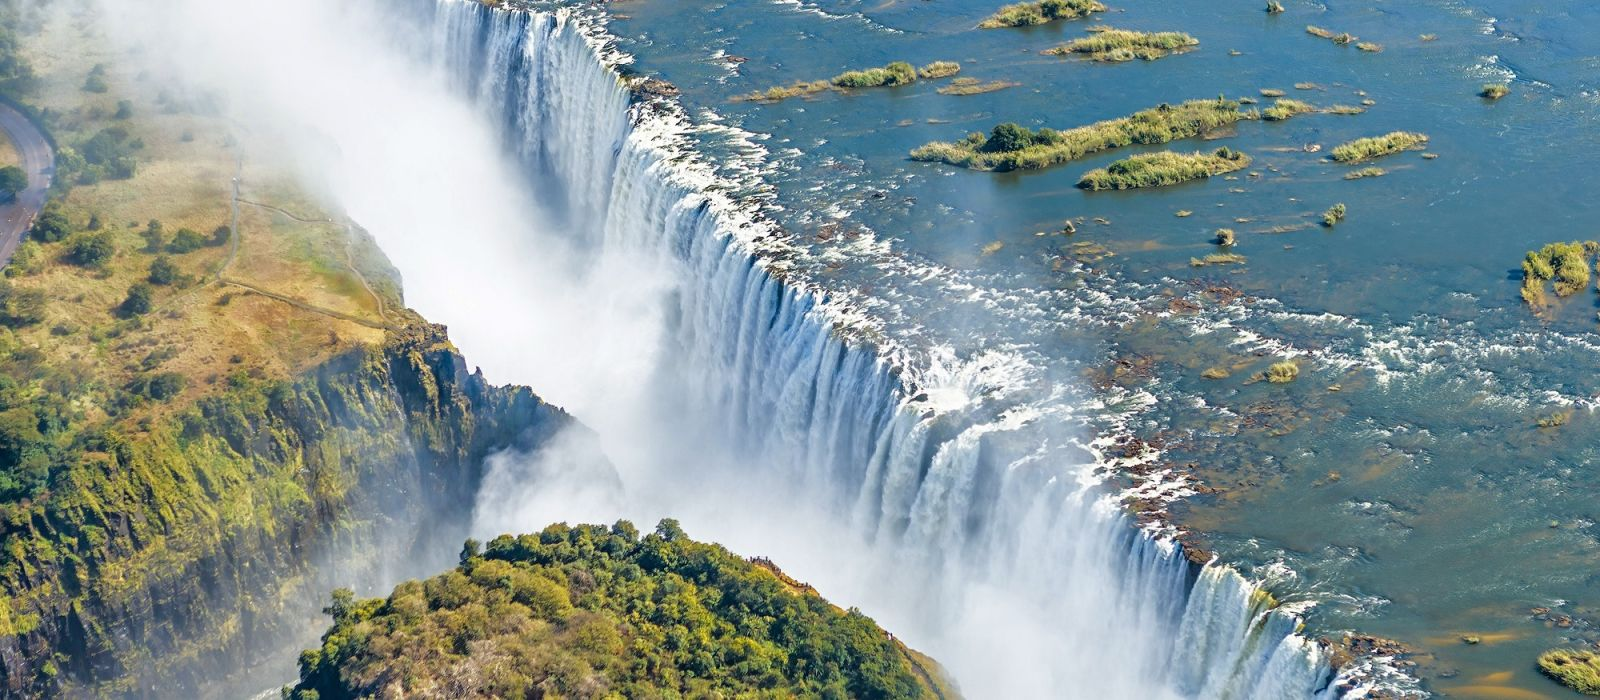 Sambia und Südafrika: Panoramaroute, Safari und Viktoriafälle Urlaub 2